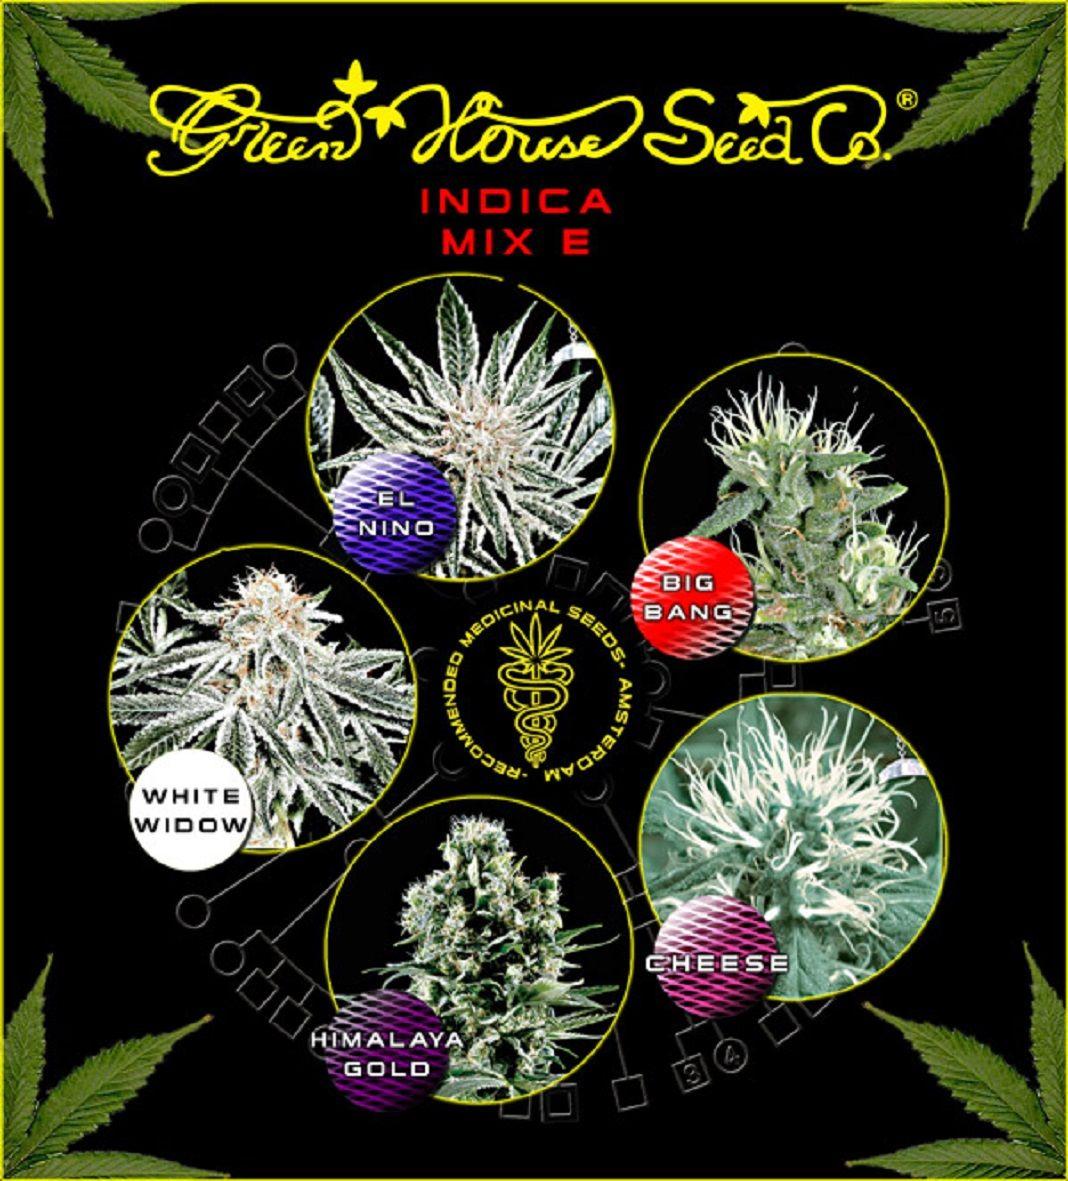 Green House Seeds Indica Mix E